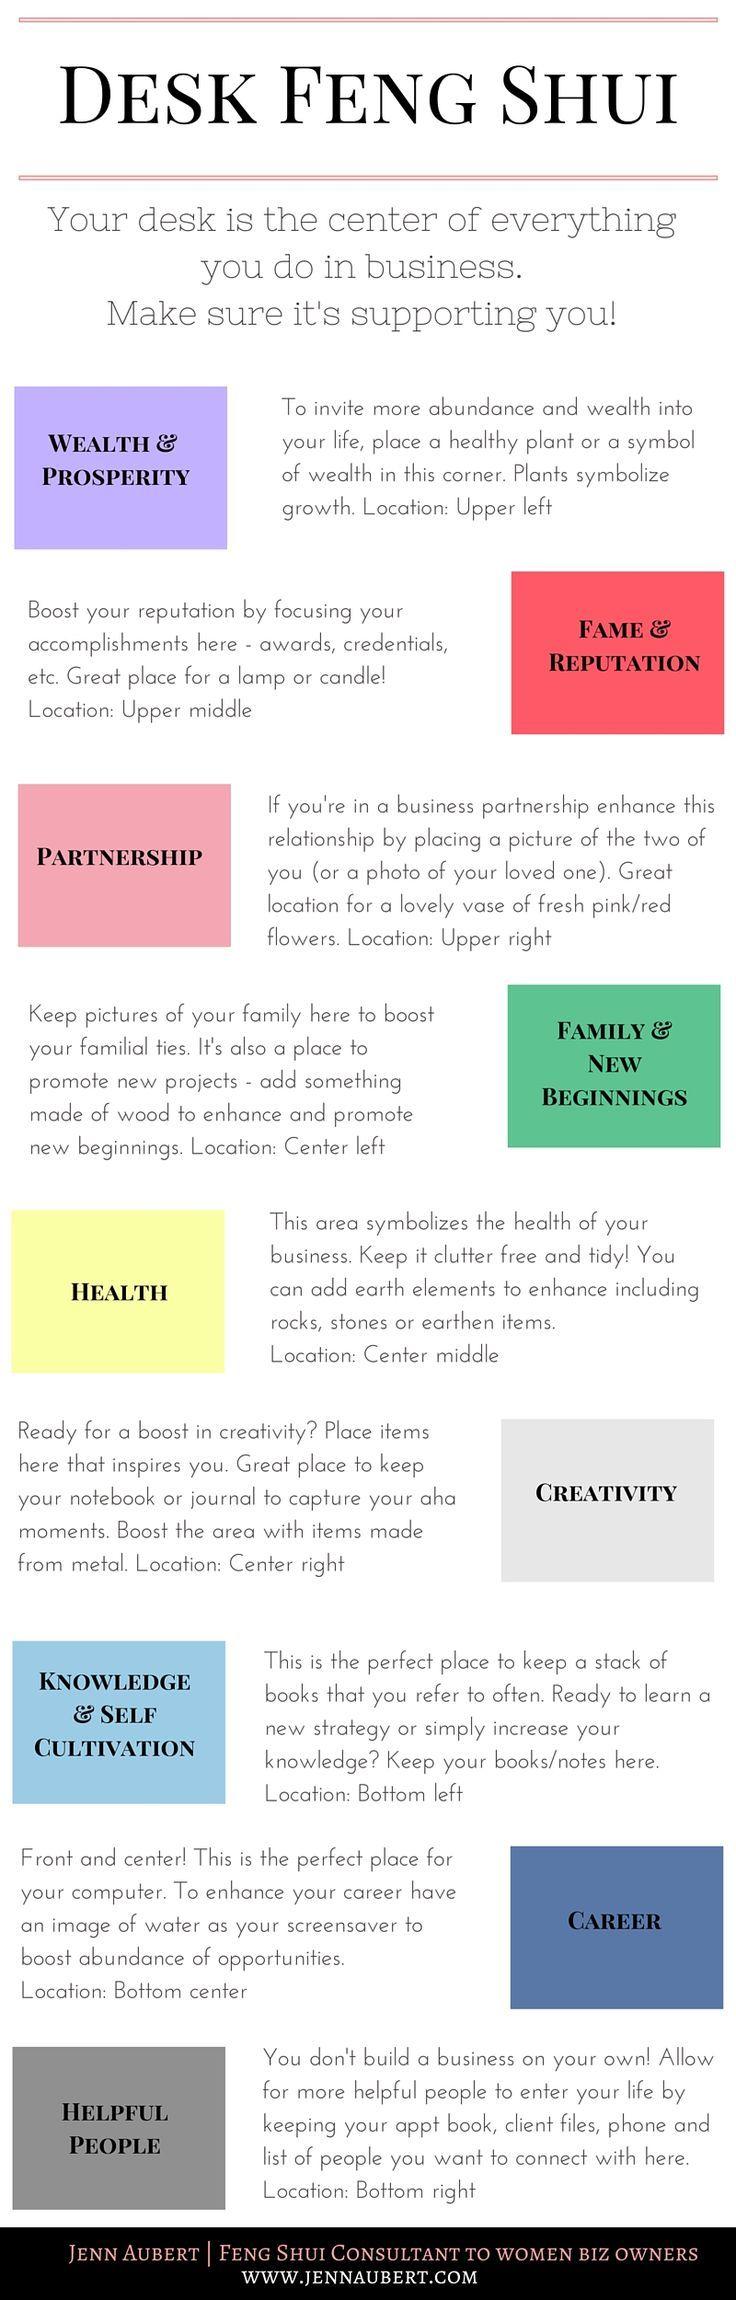 Desk Feng Shui for Business Success